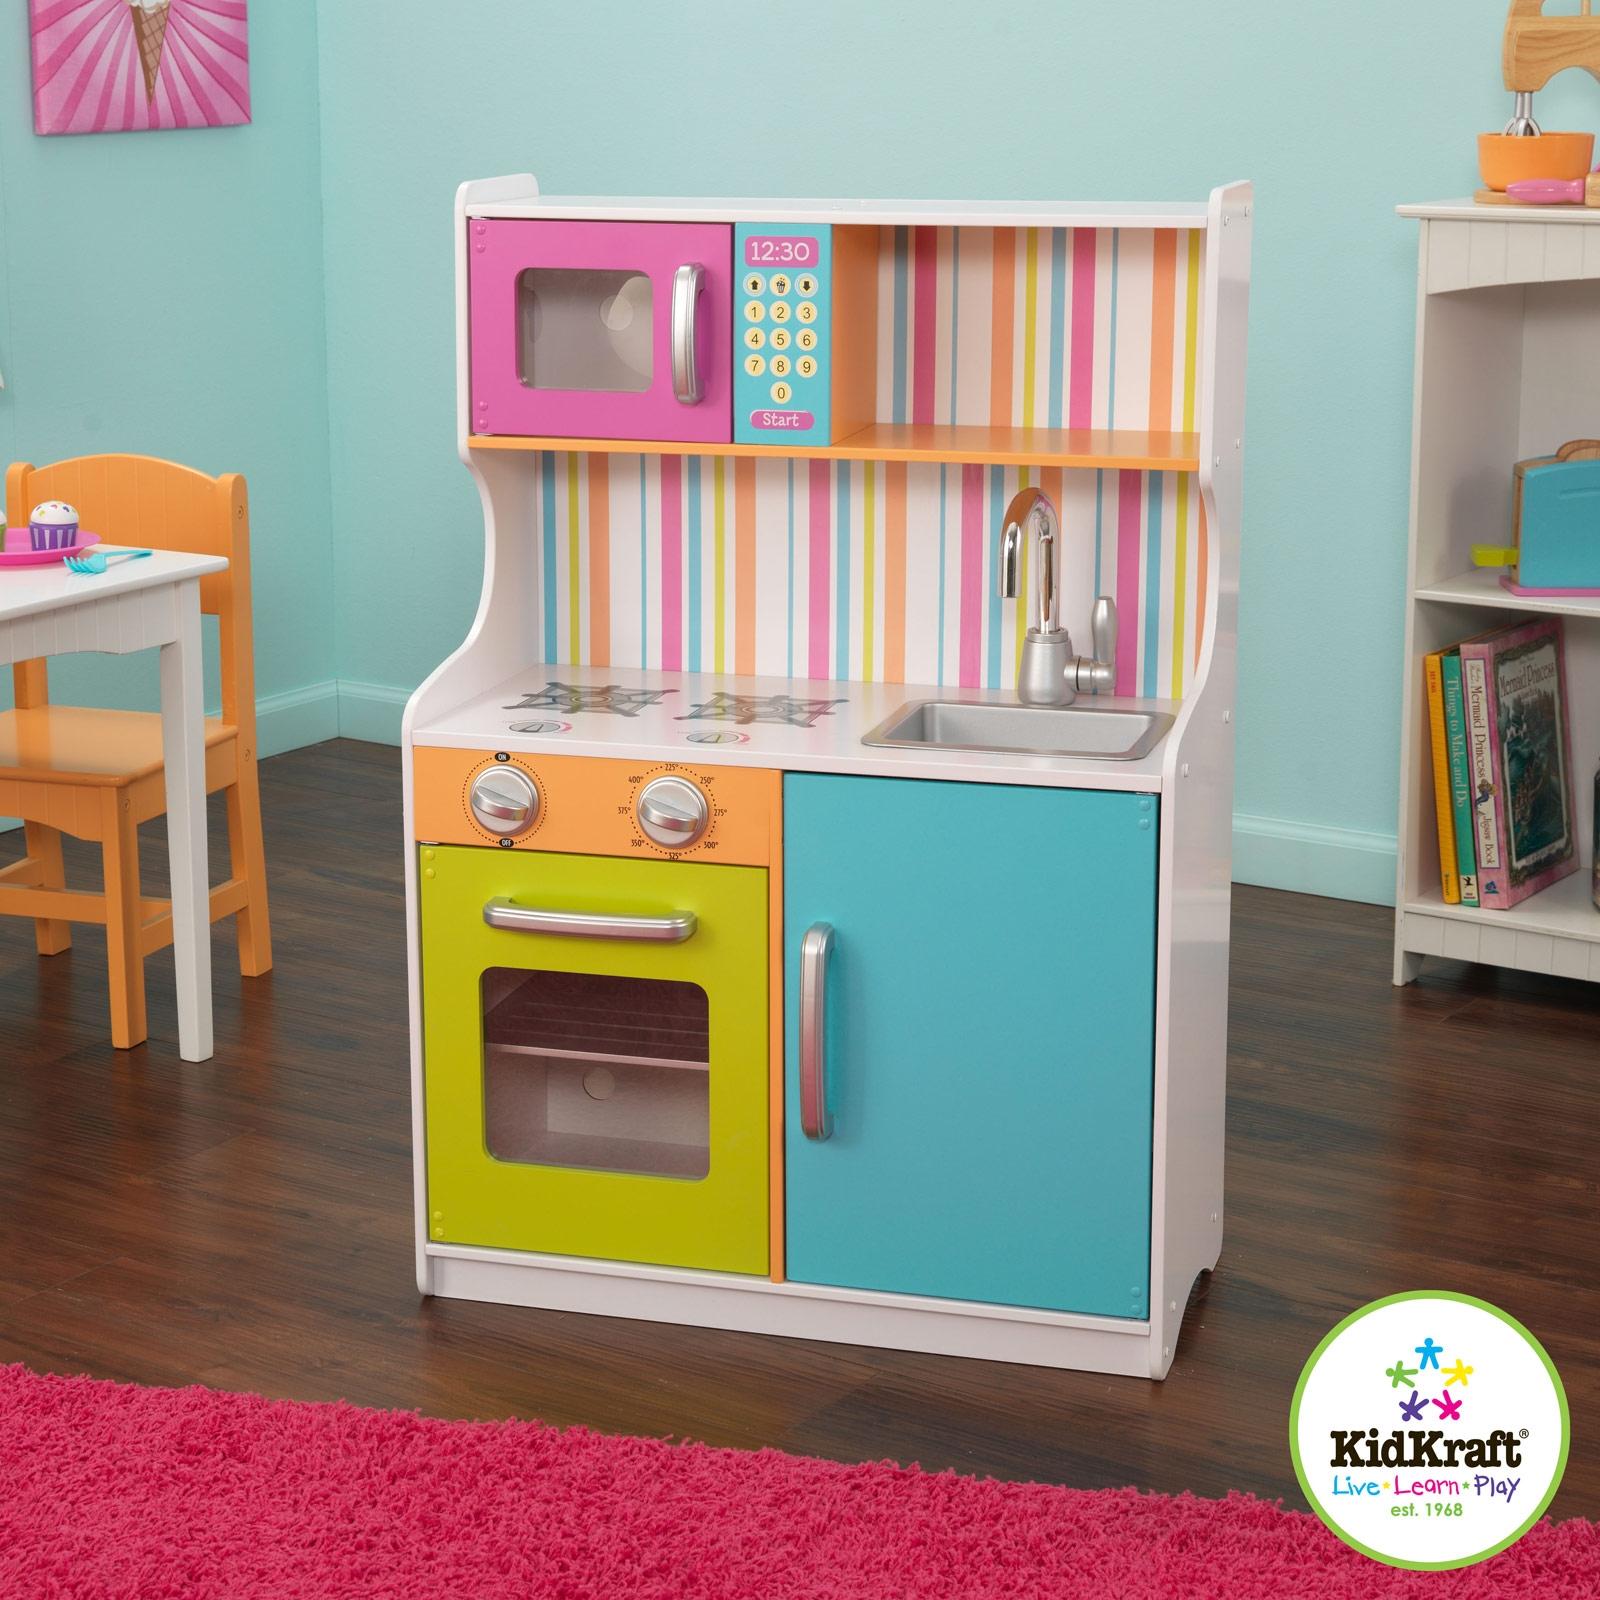 Cuisine bright multicolore : kidkraft   berceau magique